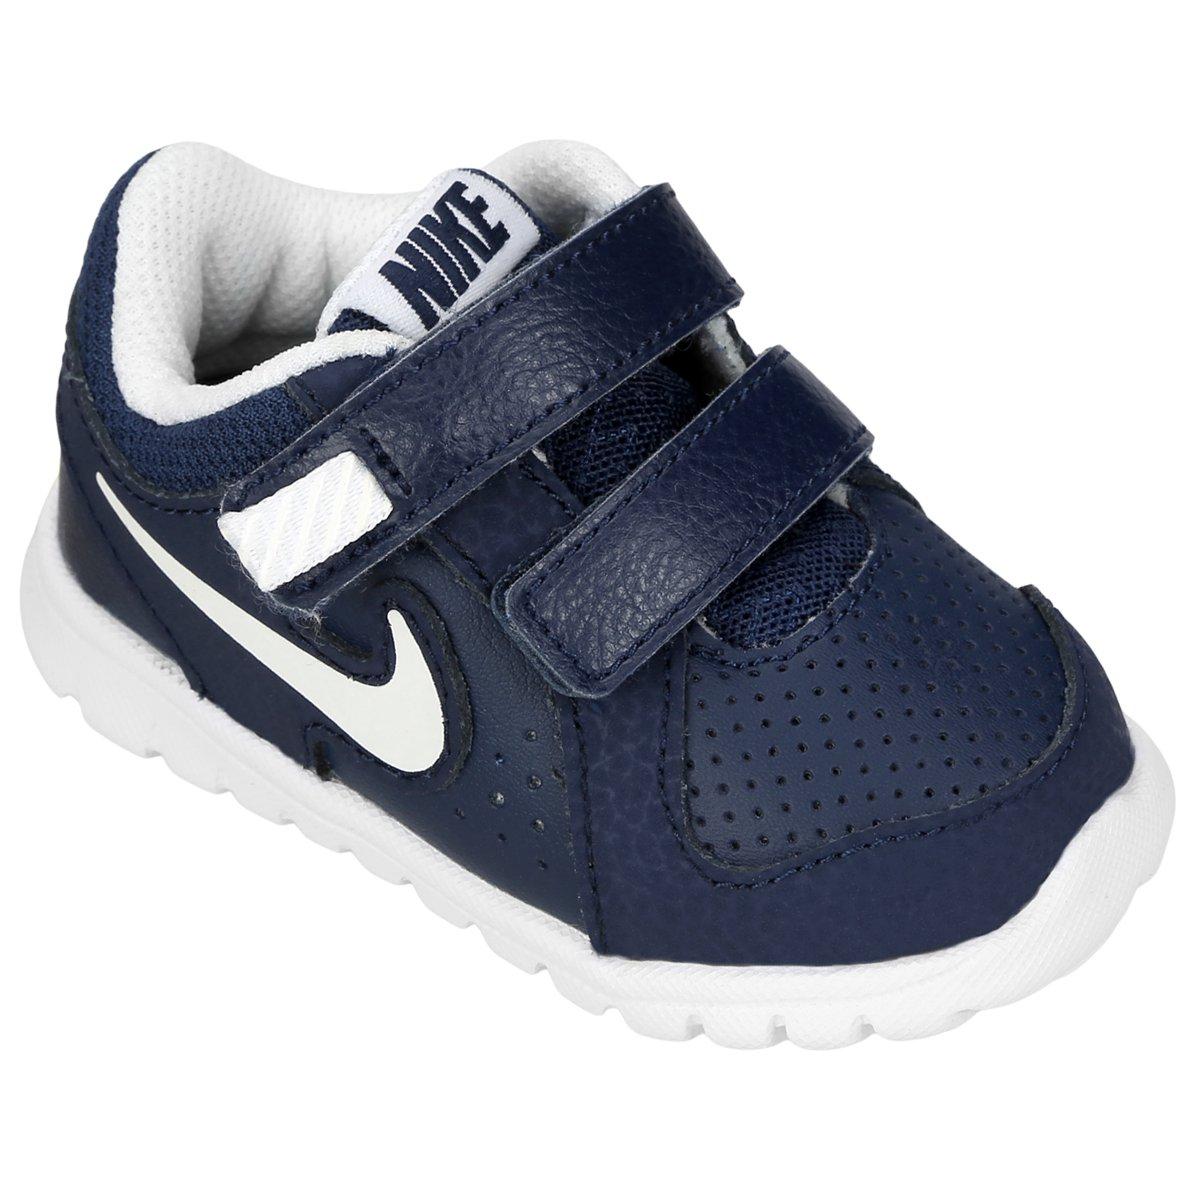 dc3fbcd7674 Tênis Nike Flex Experience Ltr Infantil - Azul e Branco - Compre Agora